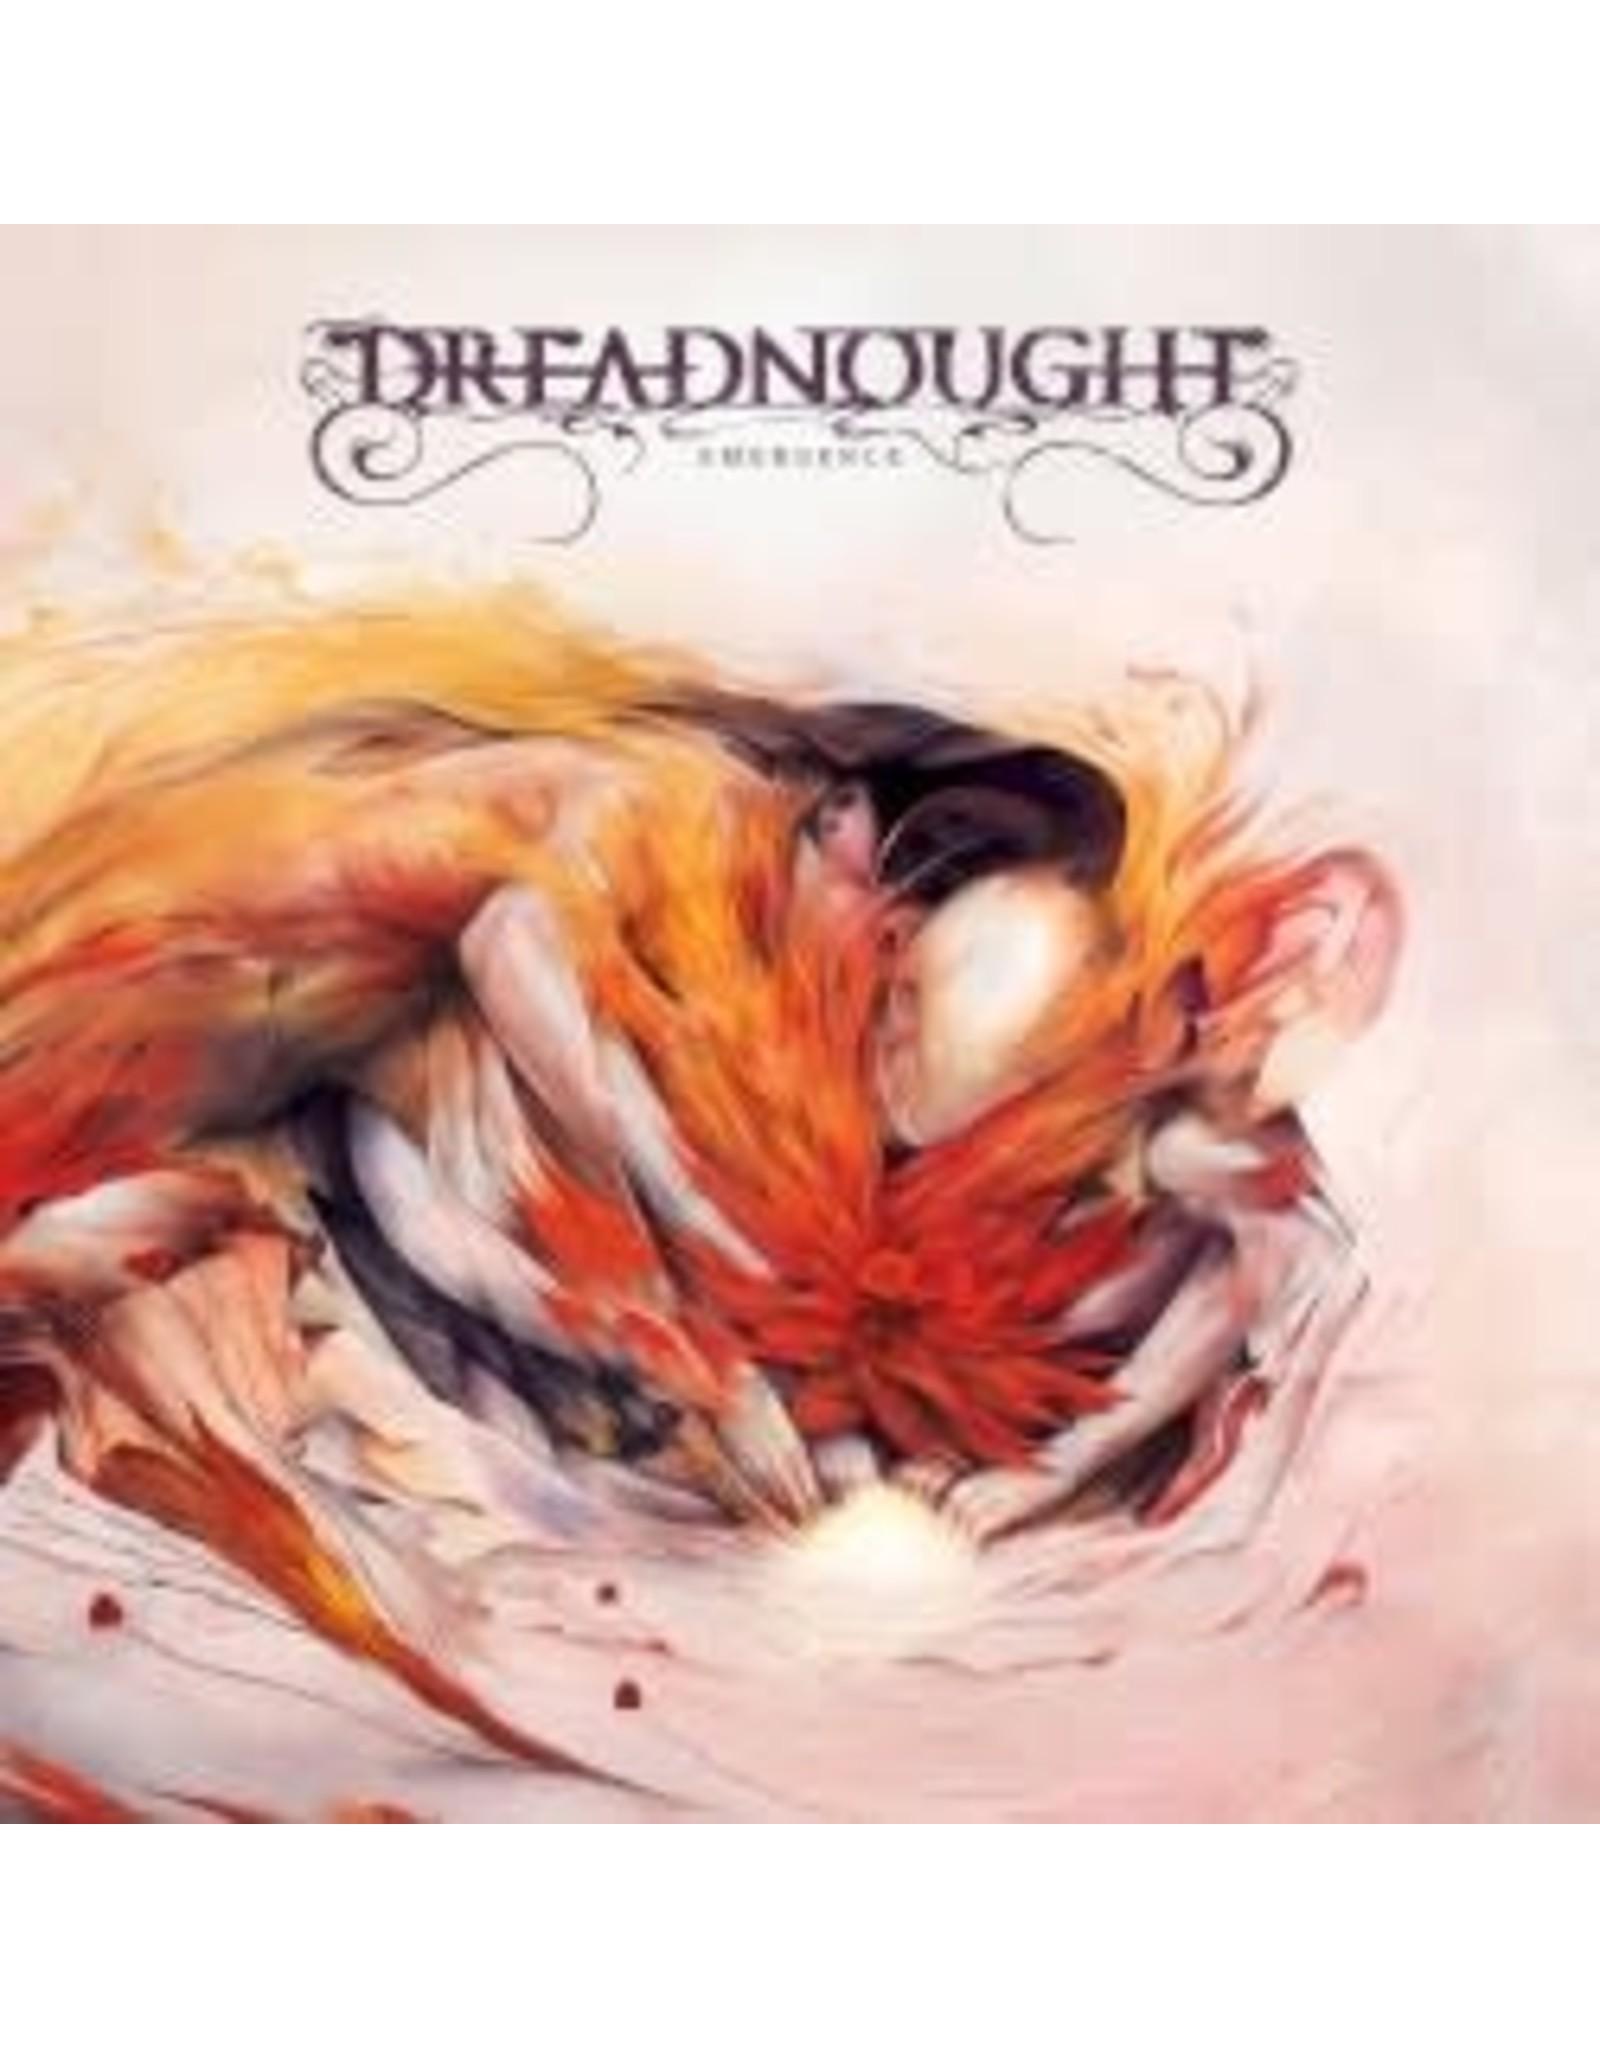 Dreadnought - Emergence LP